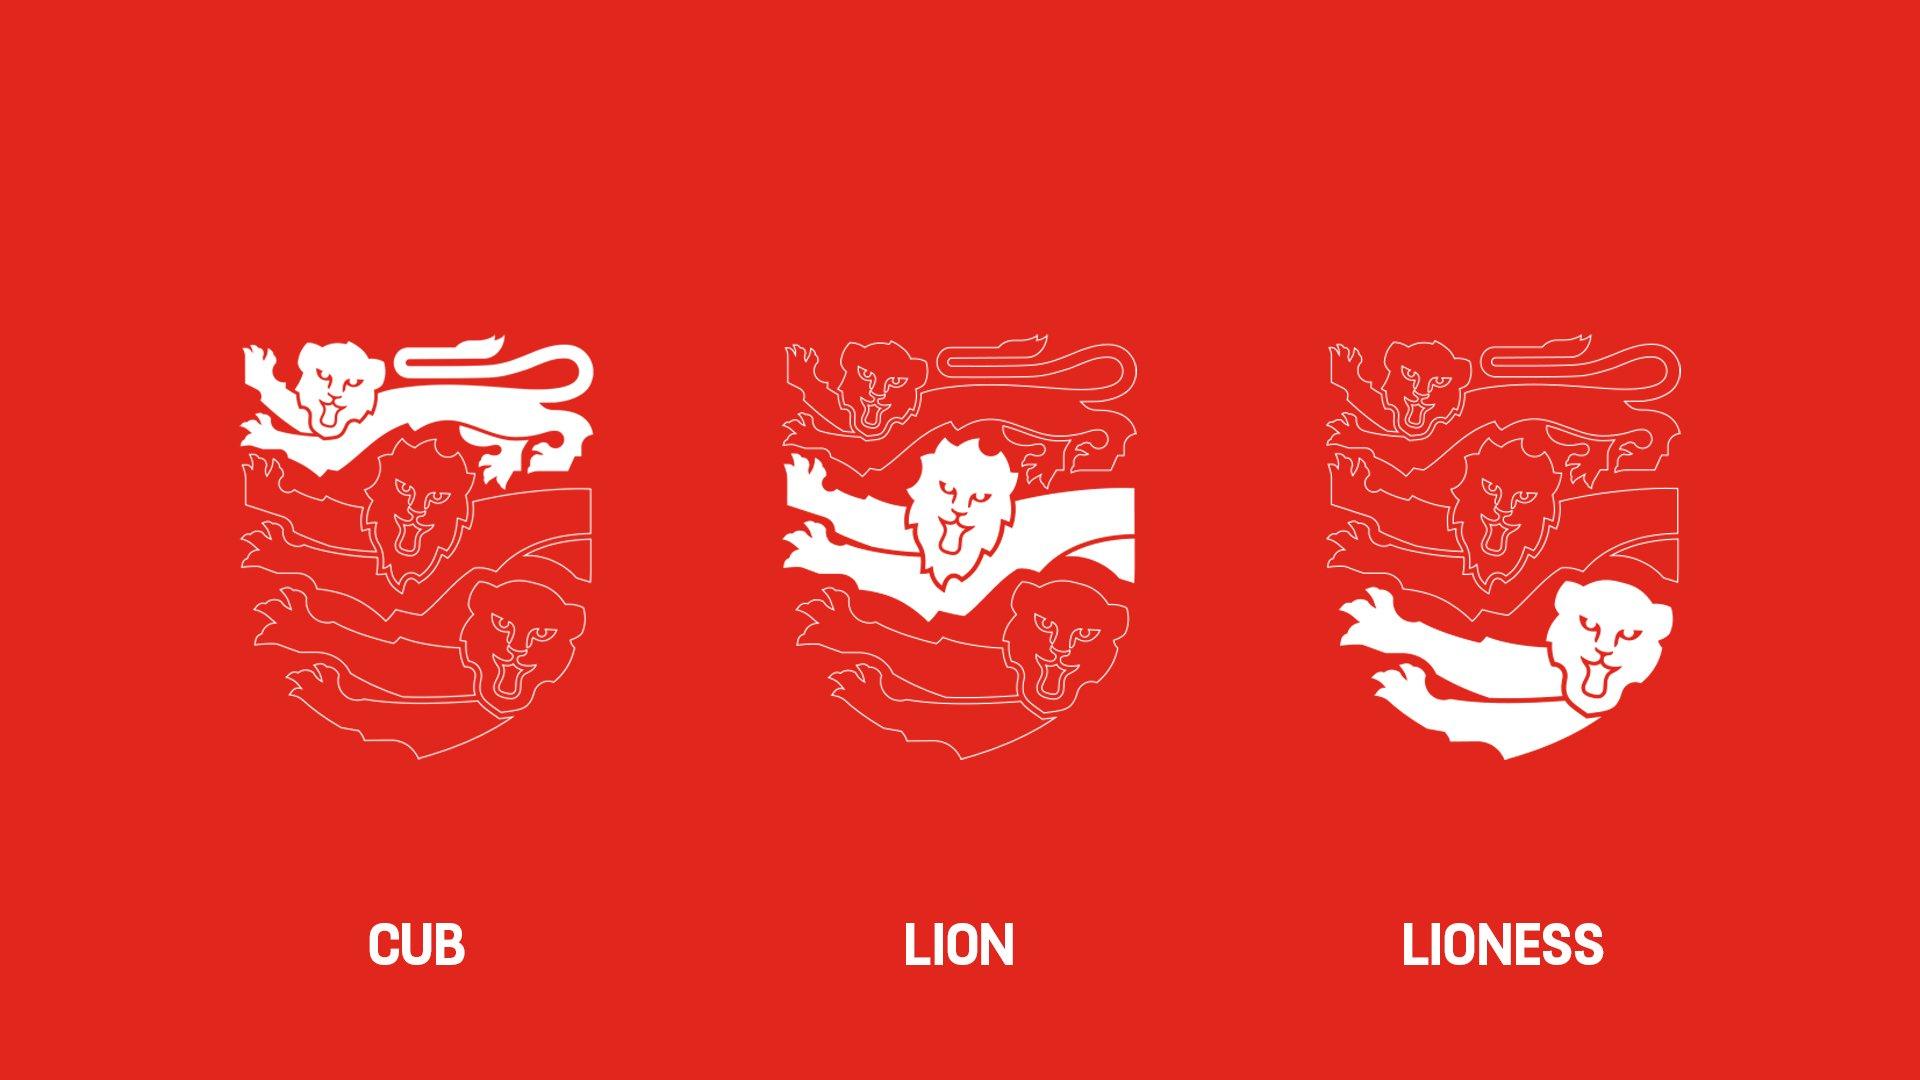 Thumbnail for England Football Brand Identity